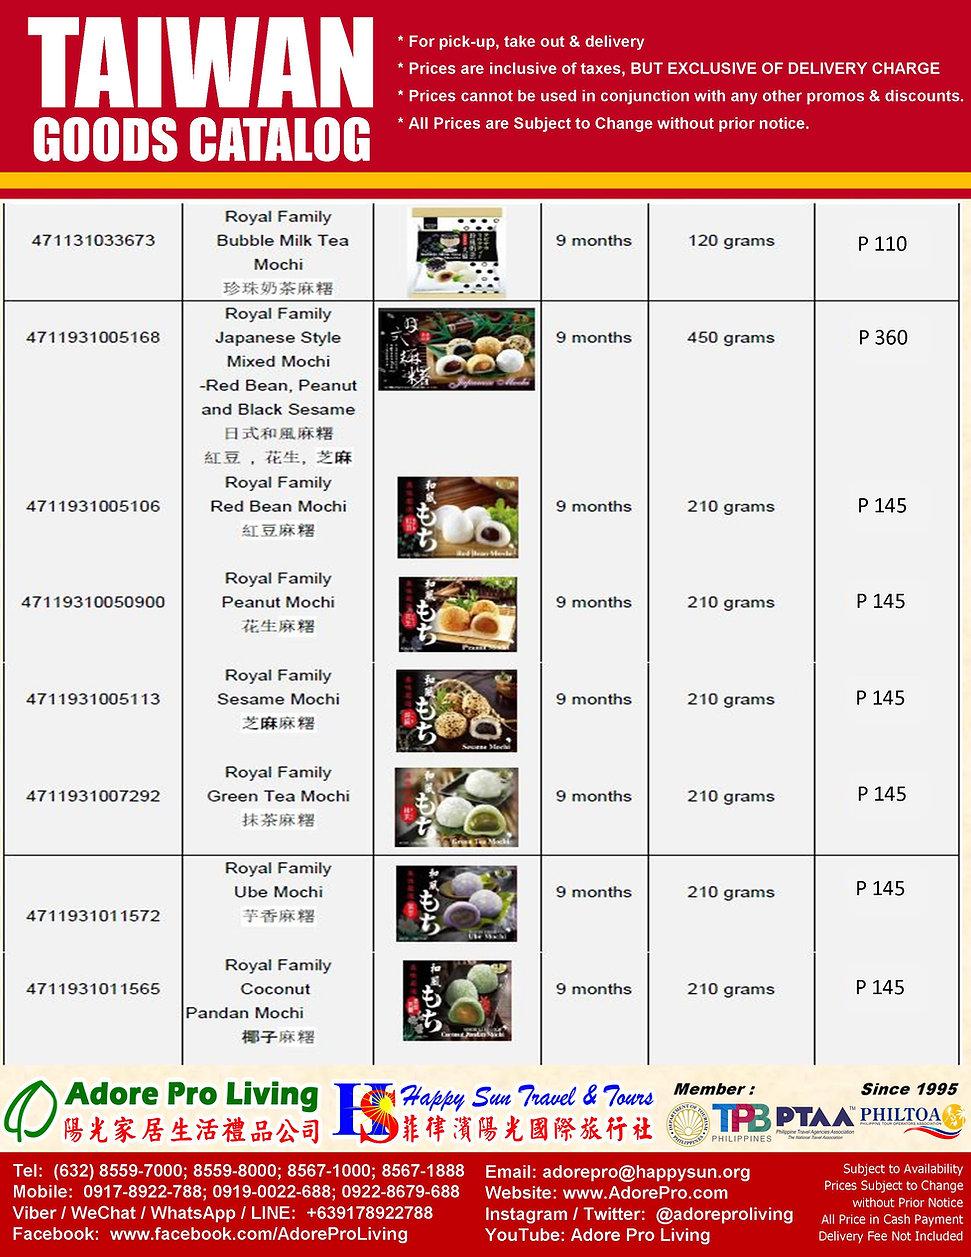 P3_Taiwan Goods Catalog_202009119.jpg